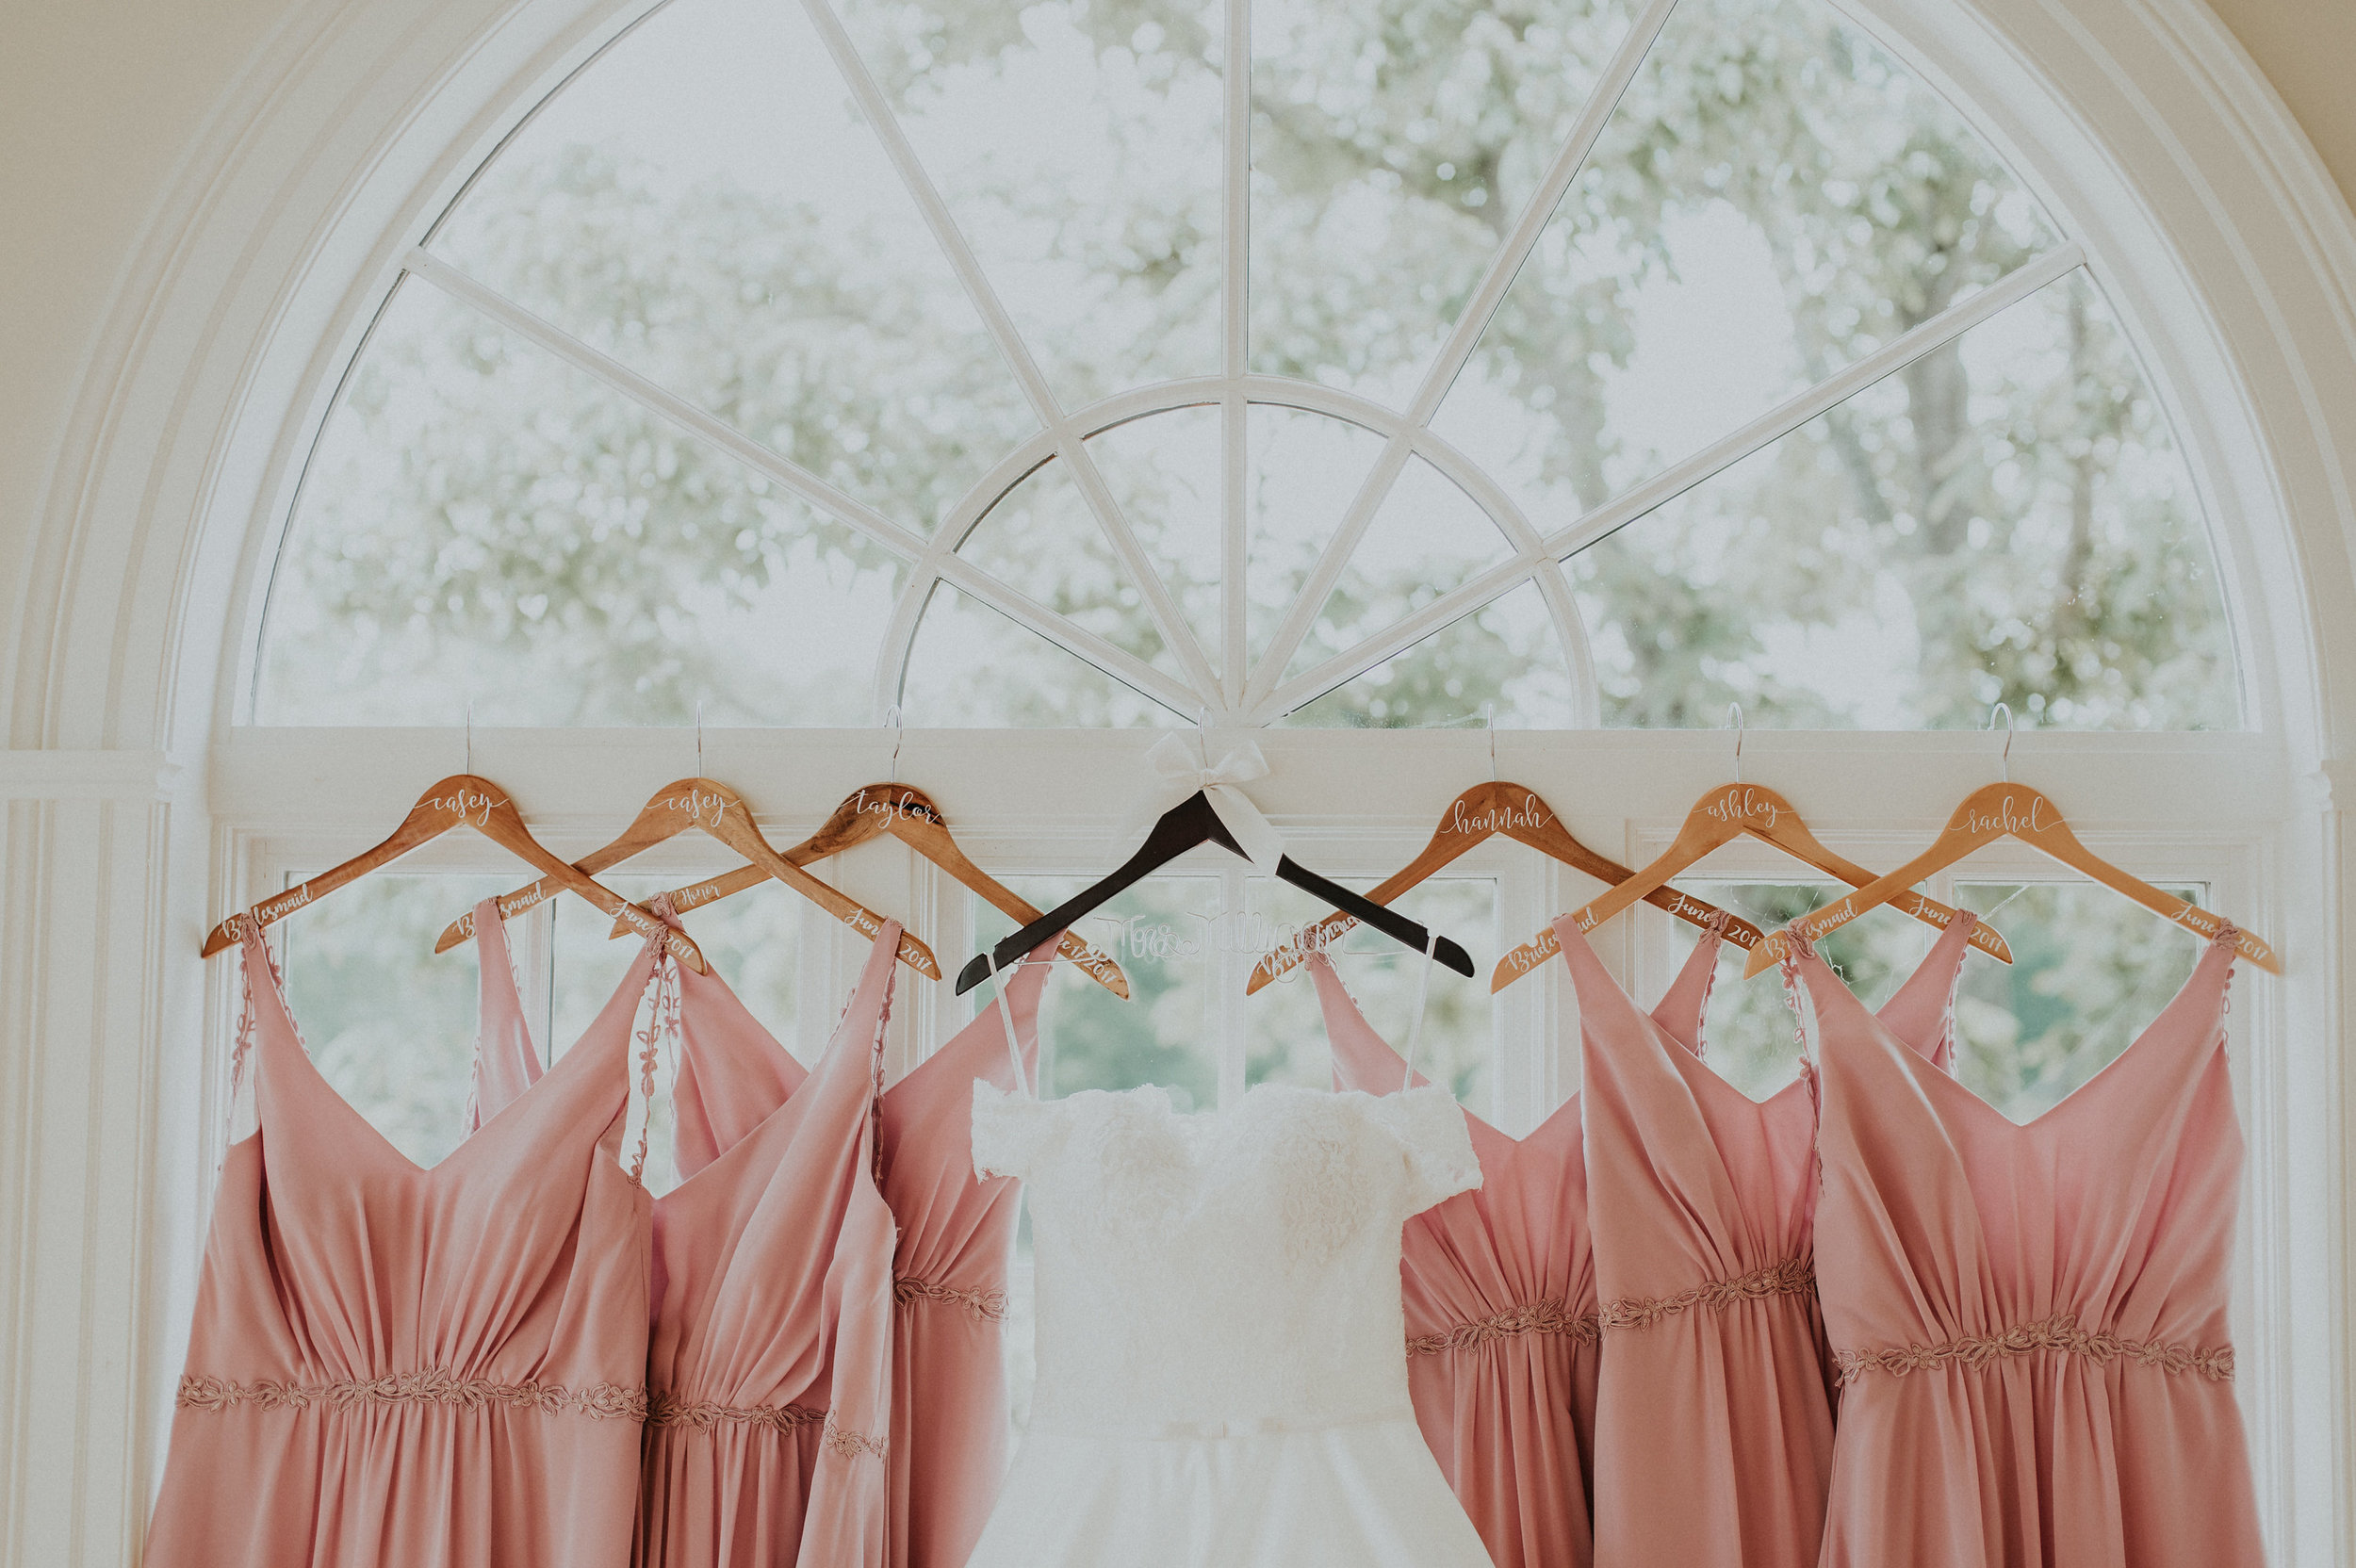 morais-wedding-virginia-wedding-planner-virginia-wedding-coordinator-leah-adkins-photography-getting-ready